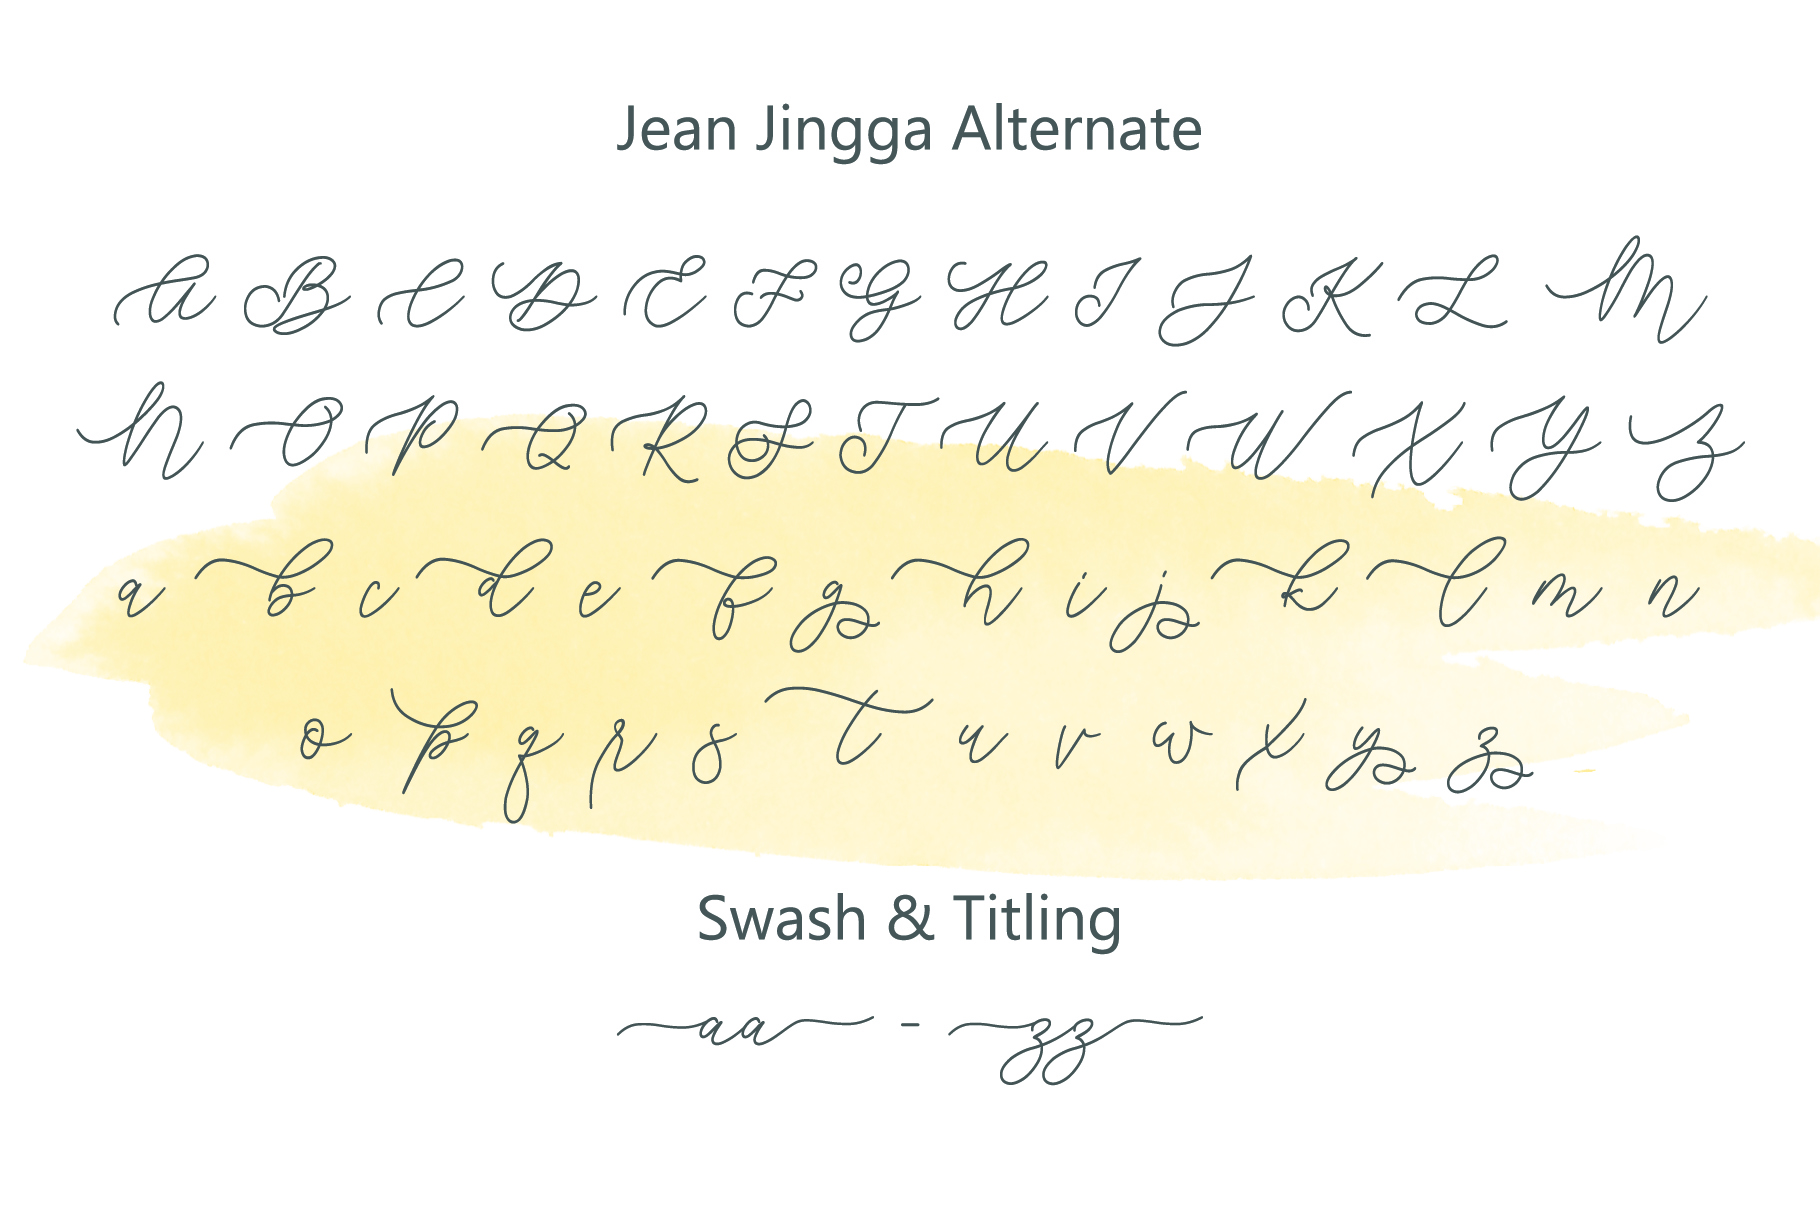 Jean Jingga example 9